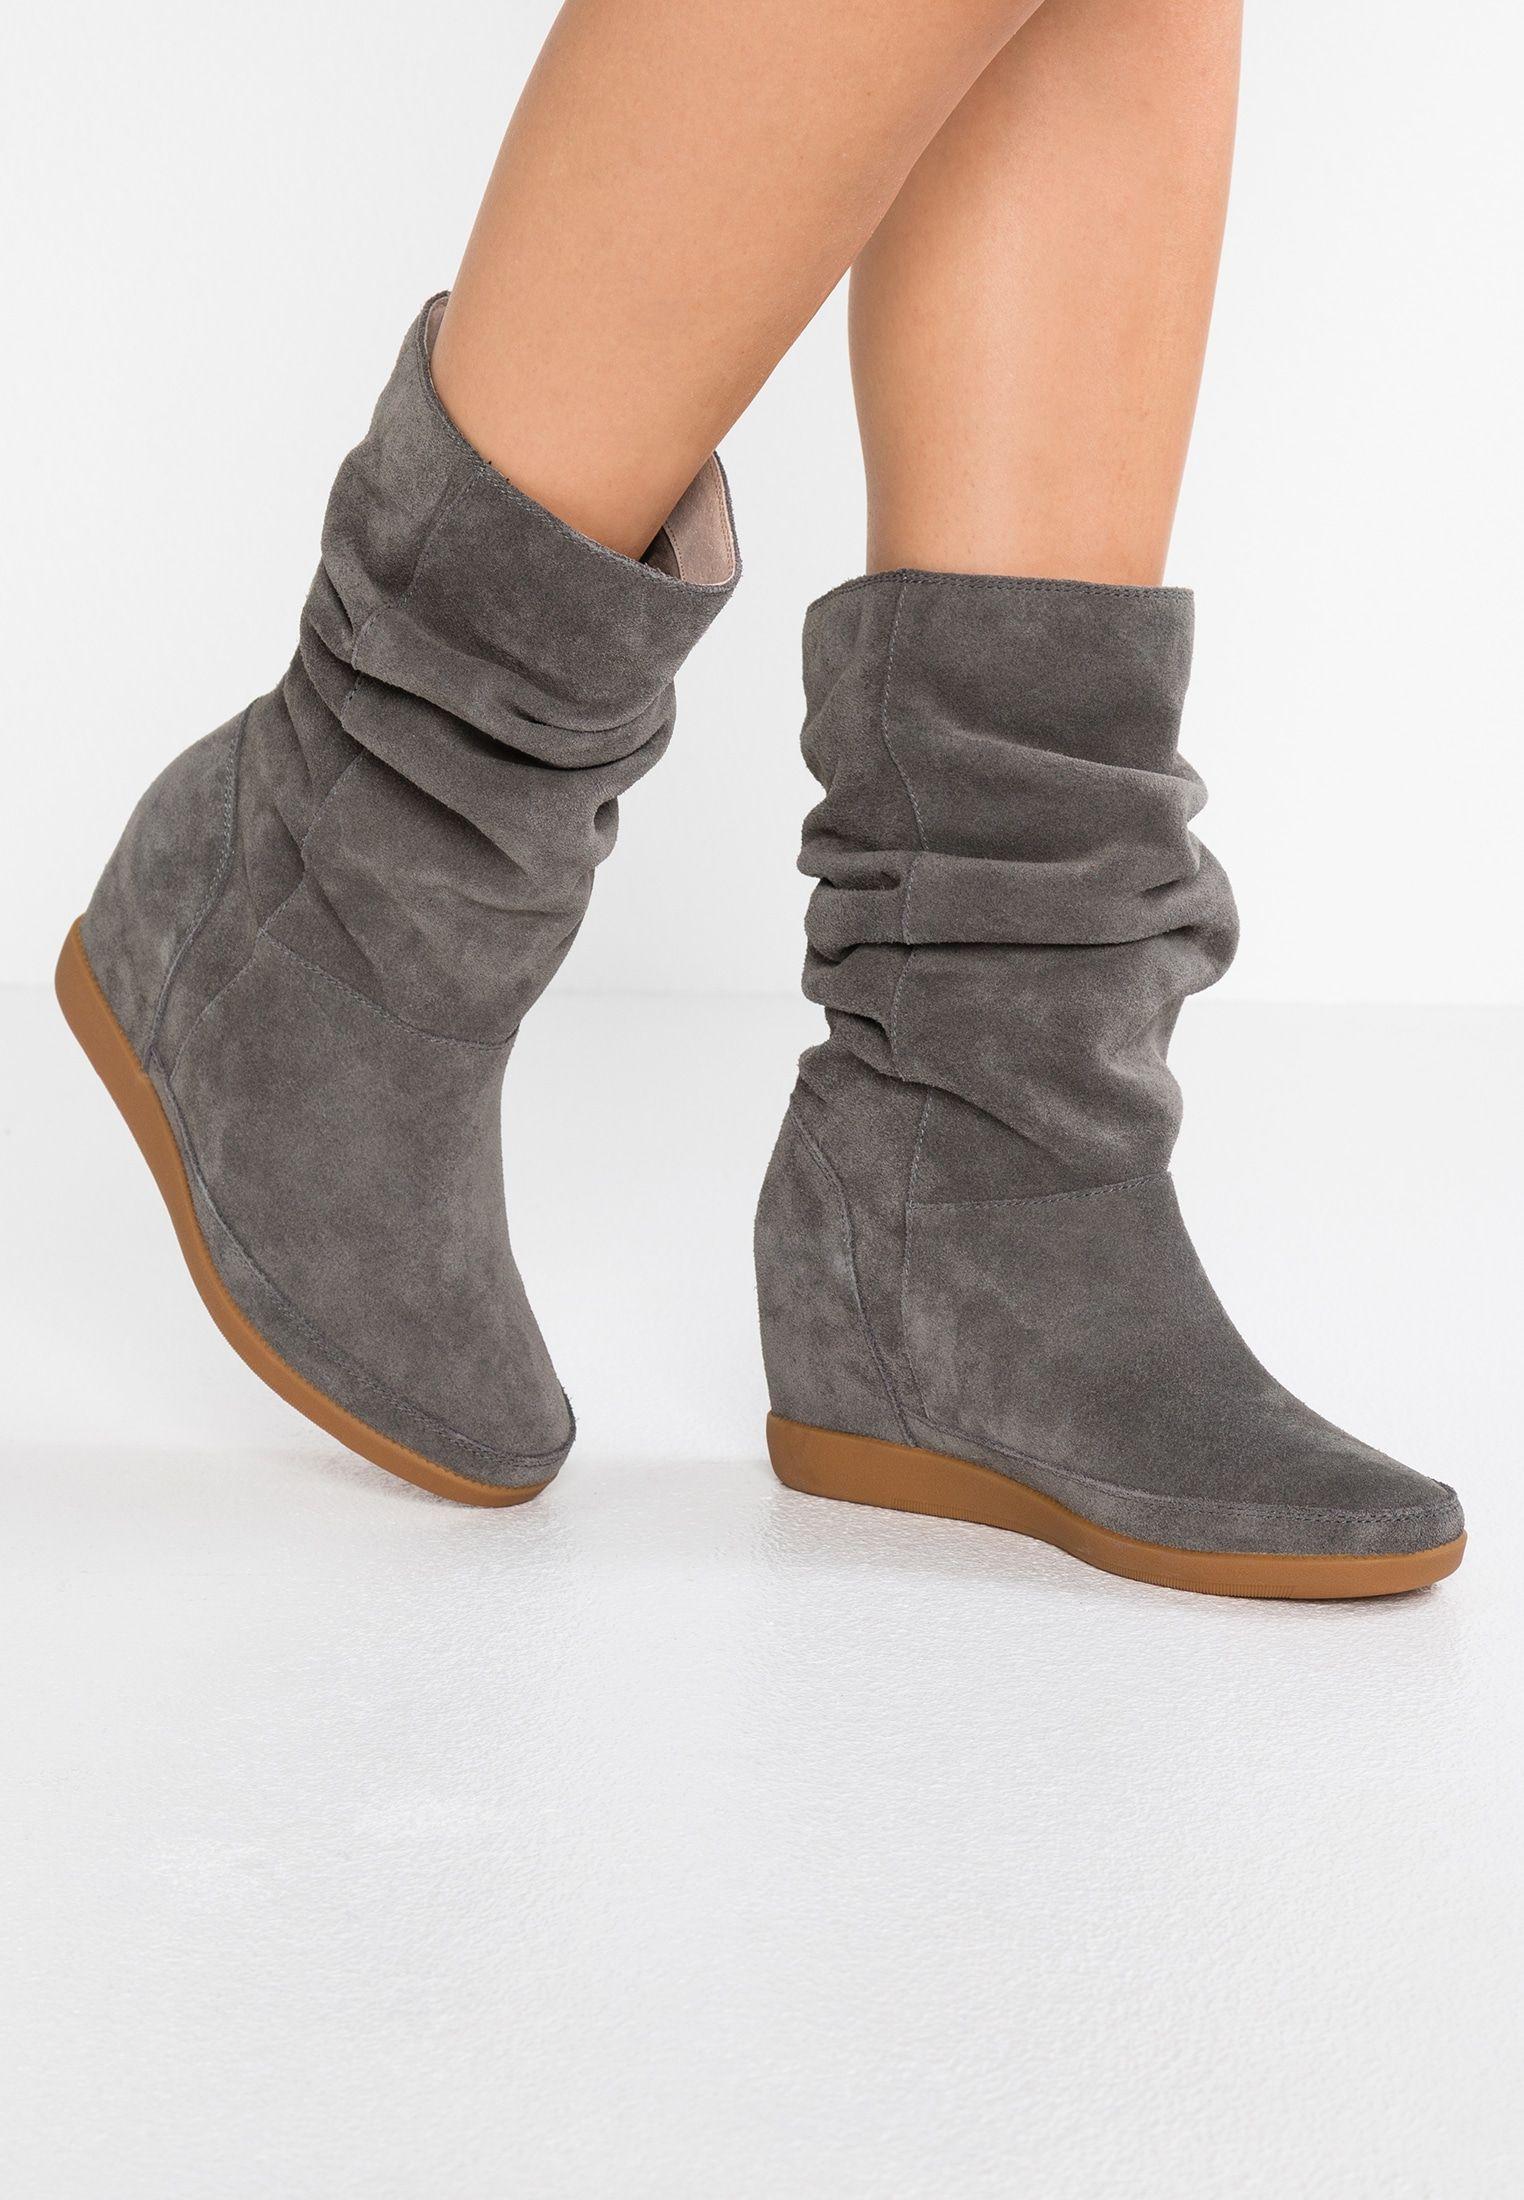 sale retailer 200df f1a88 EMMY SLOUCHY - Wedge boots - dark grey @ Zalando.co.uk ...